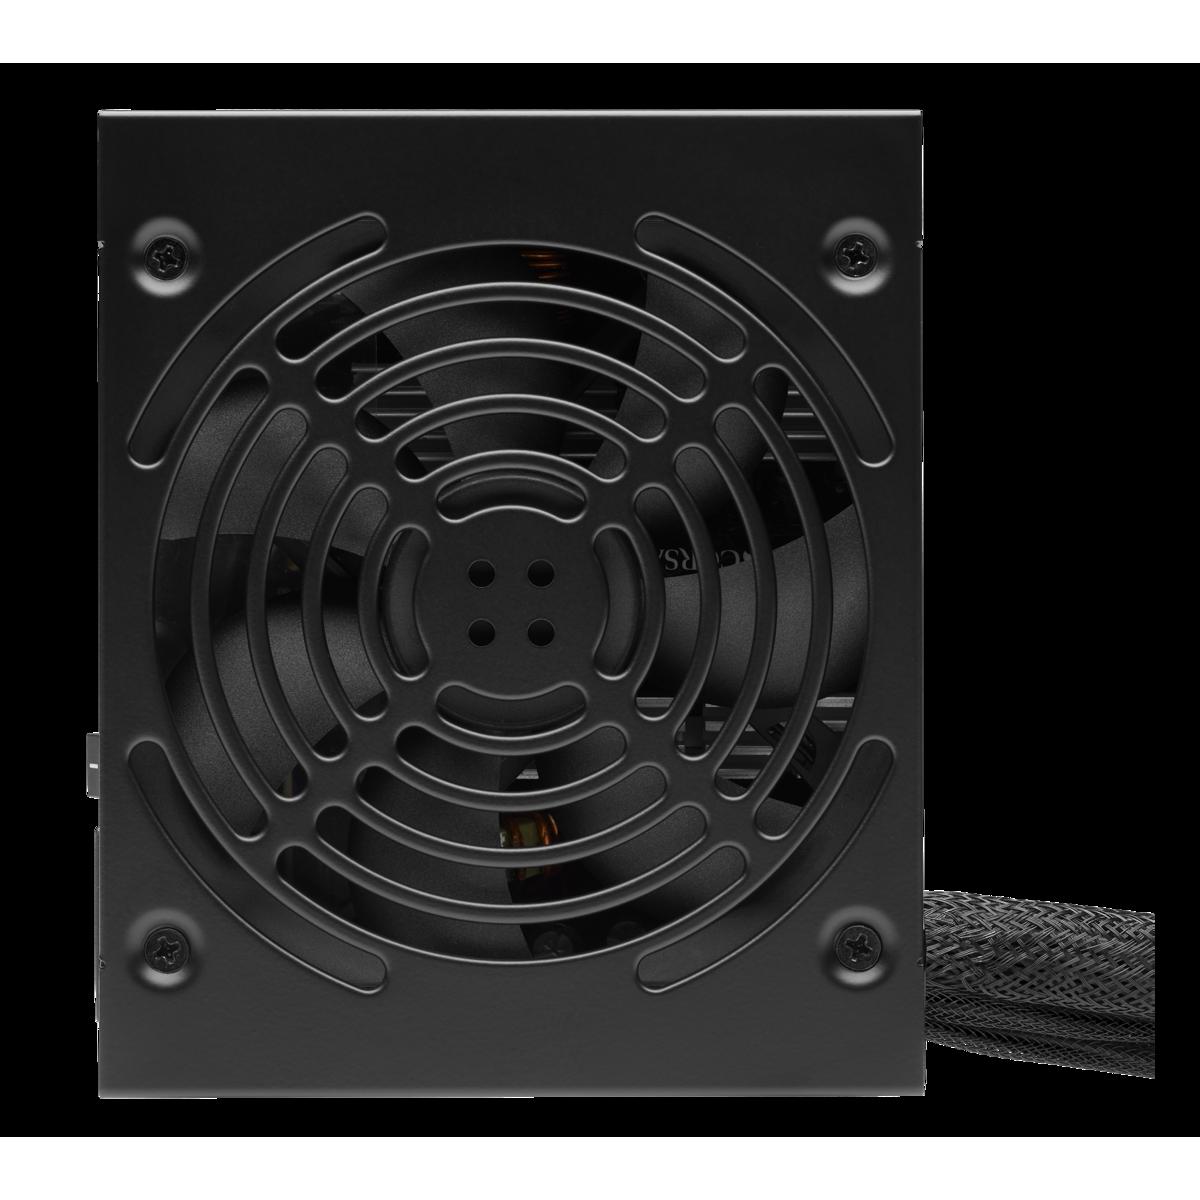 Fonte Corsair ATX CV550 550W, 80 Plus Bronze, PFC Ativo, CP-9020210-BR